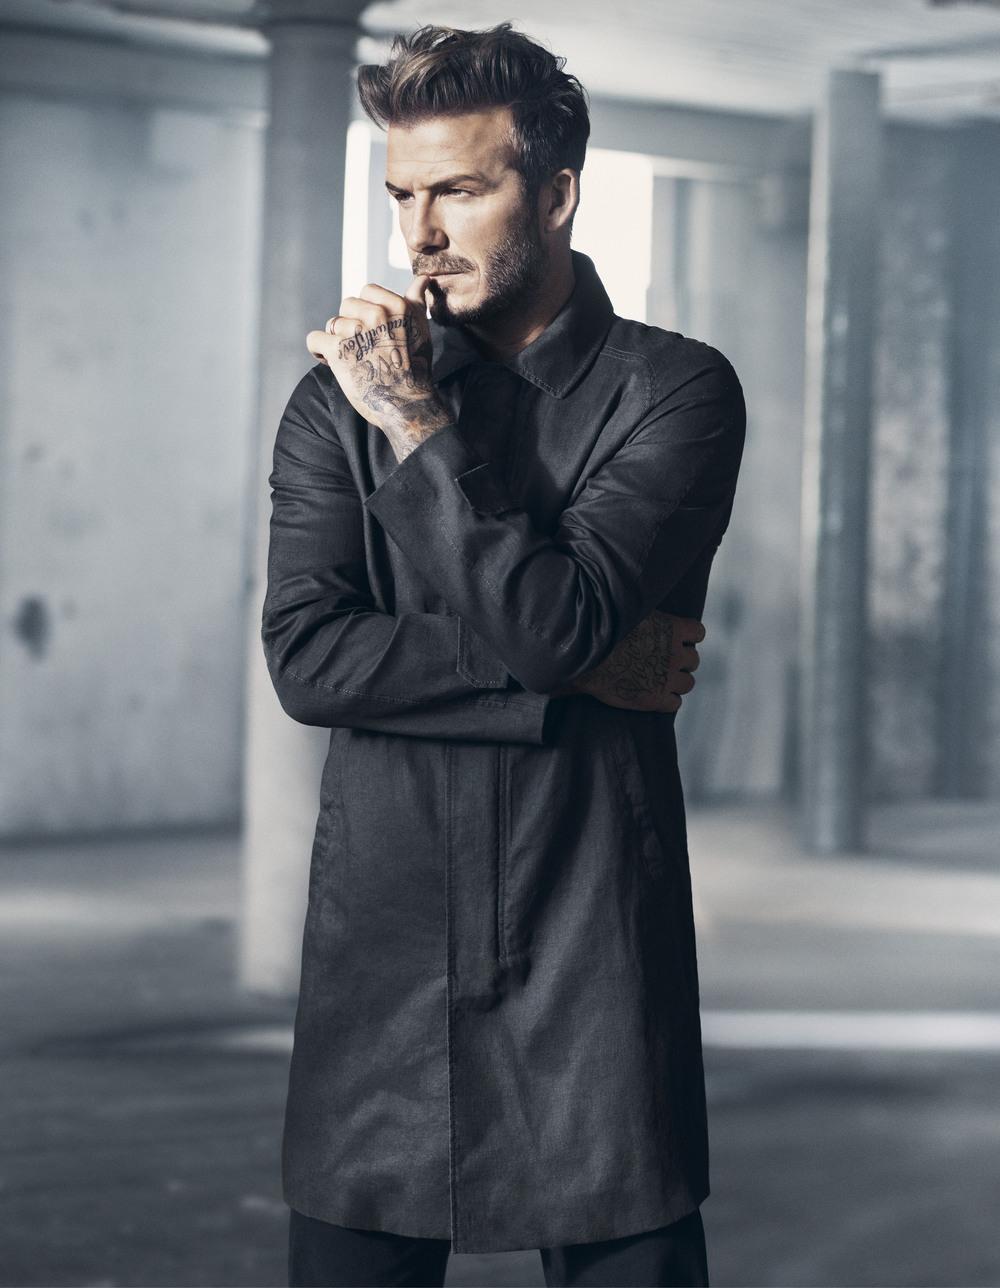 David Beckham H&M 5.jpg